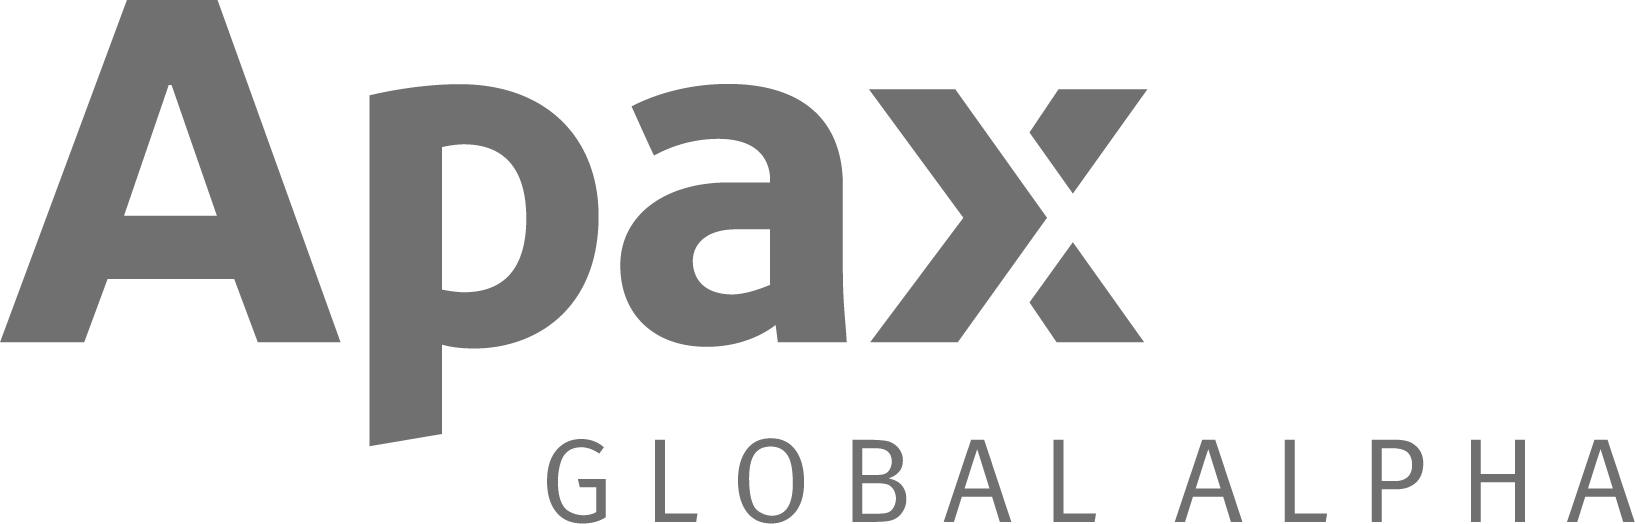 APAX GLOBAL ALPHA LIMITED Logo